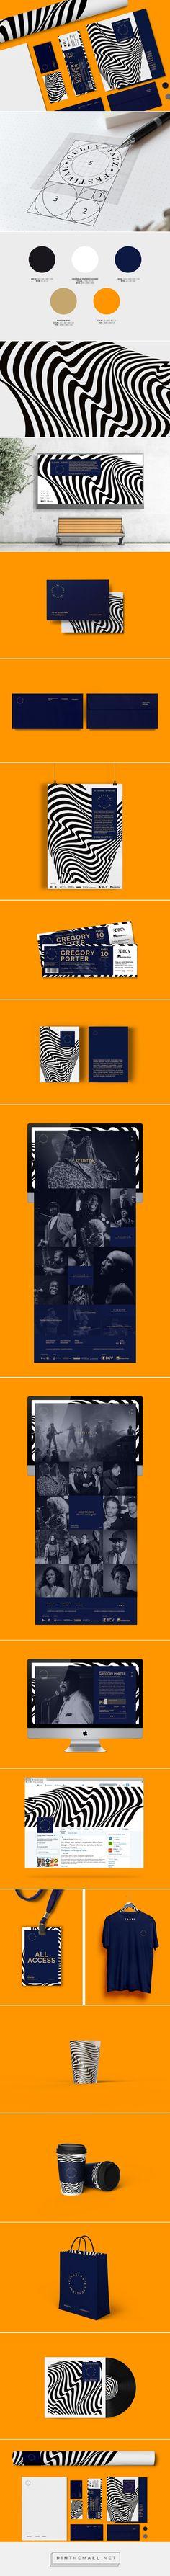 Cully Jazz Festival | Branding on Behance - created via http://pinthemall.net